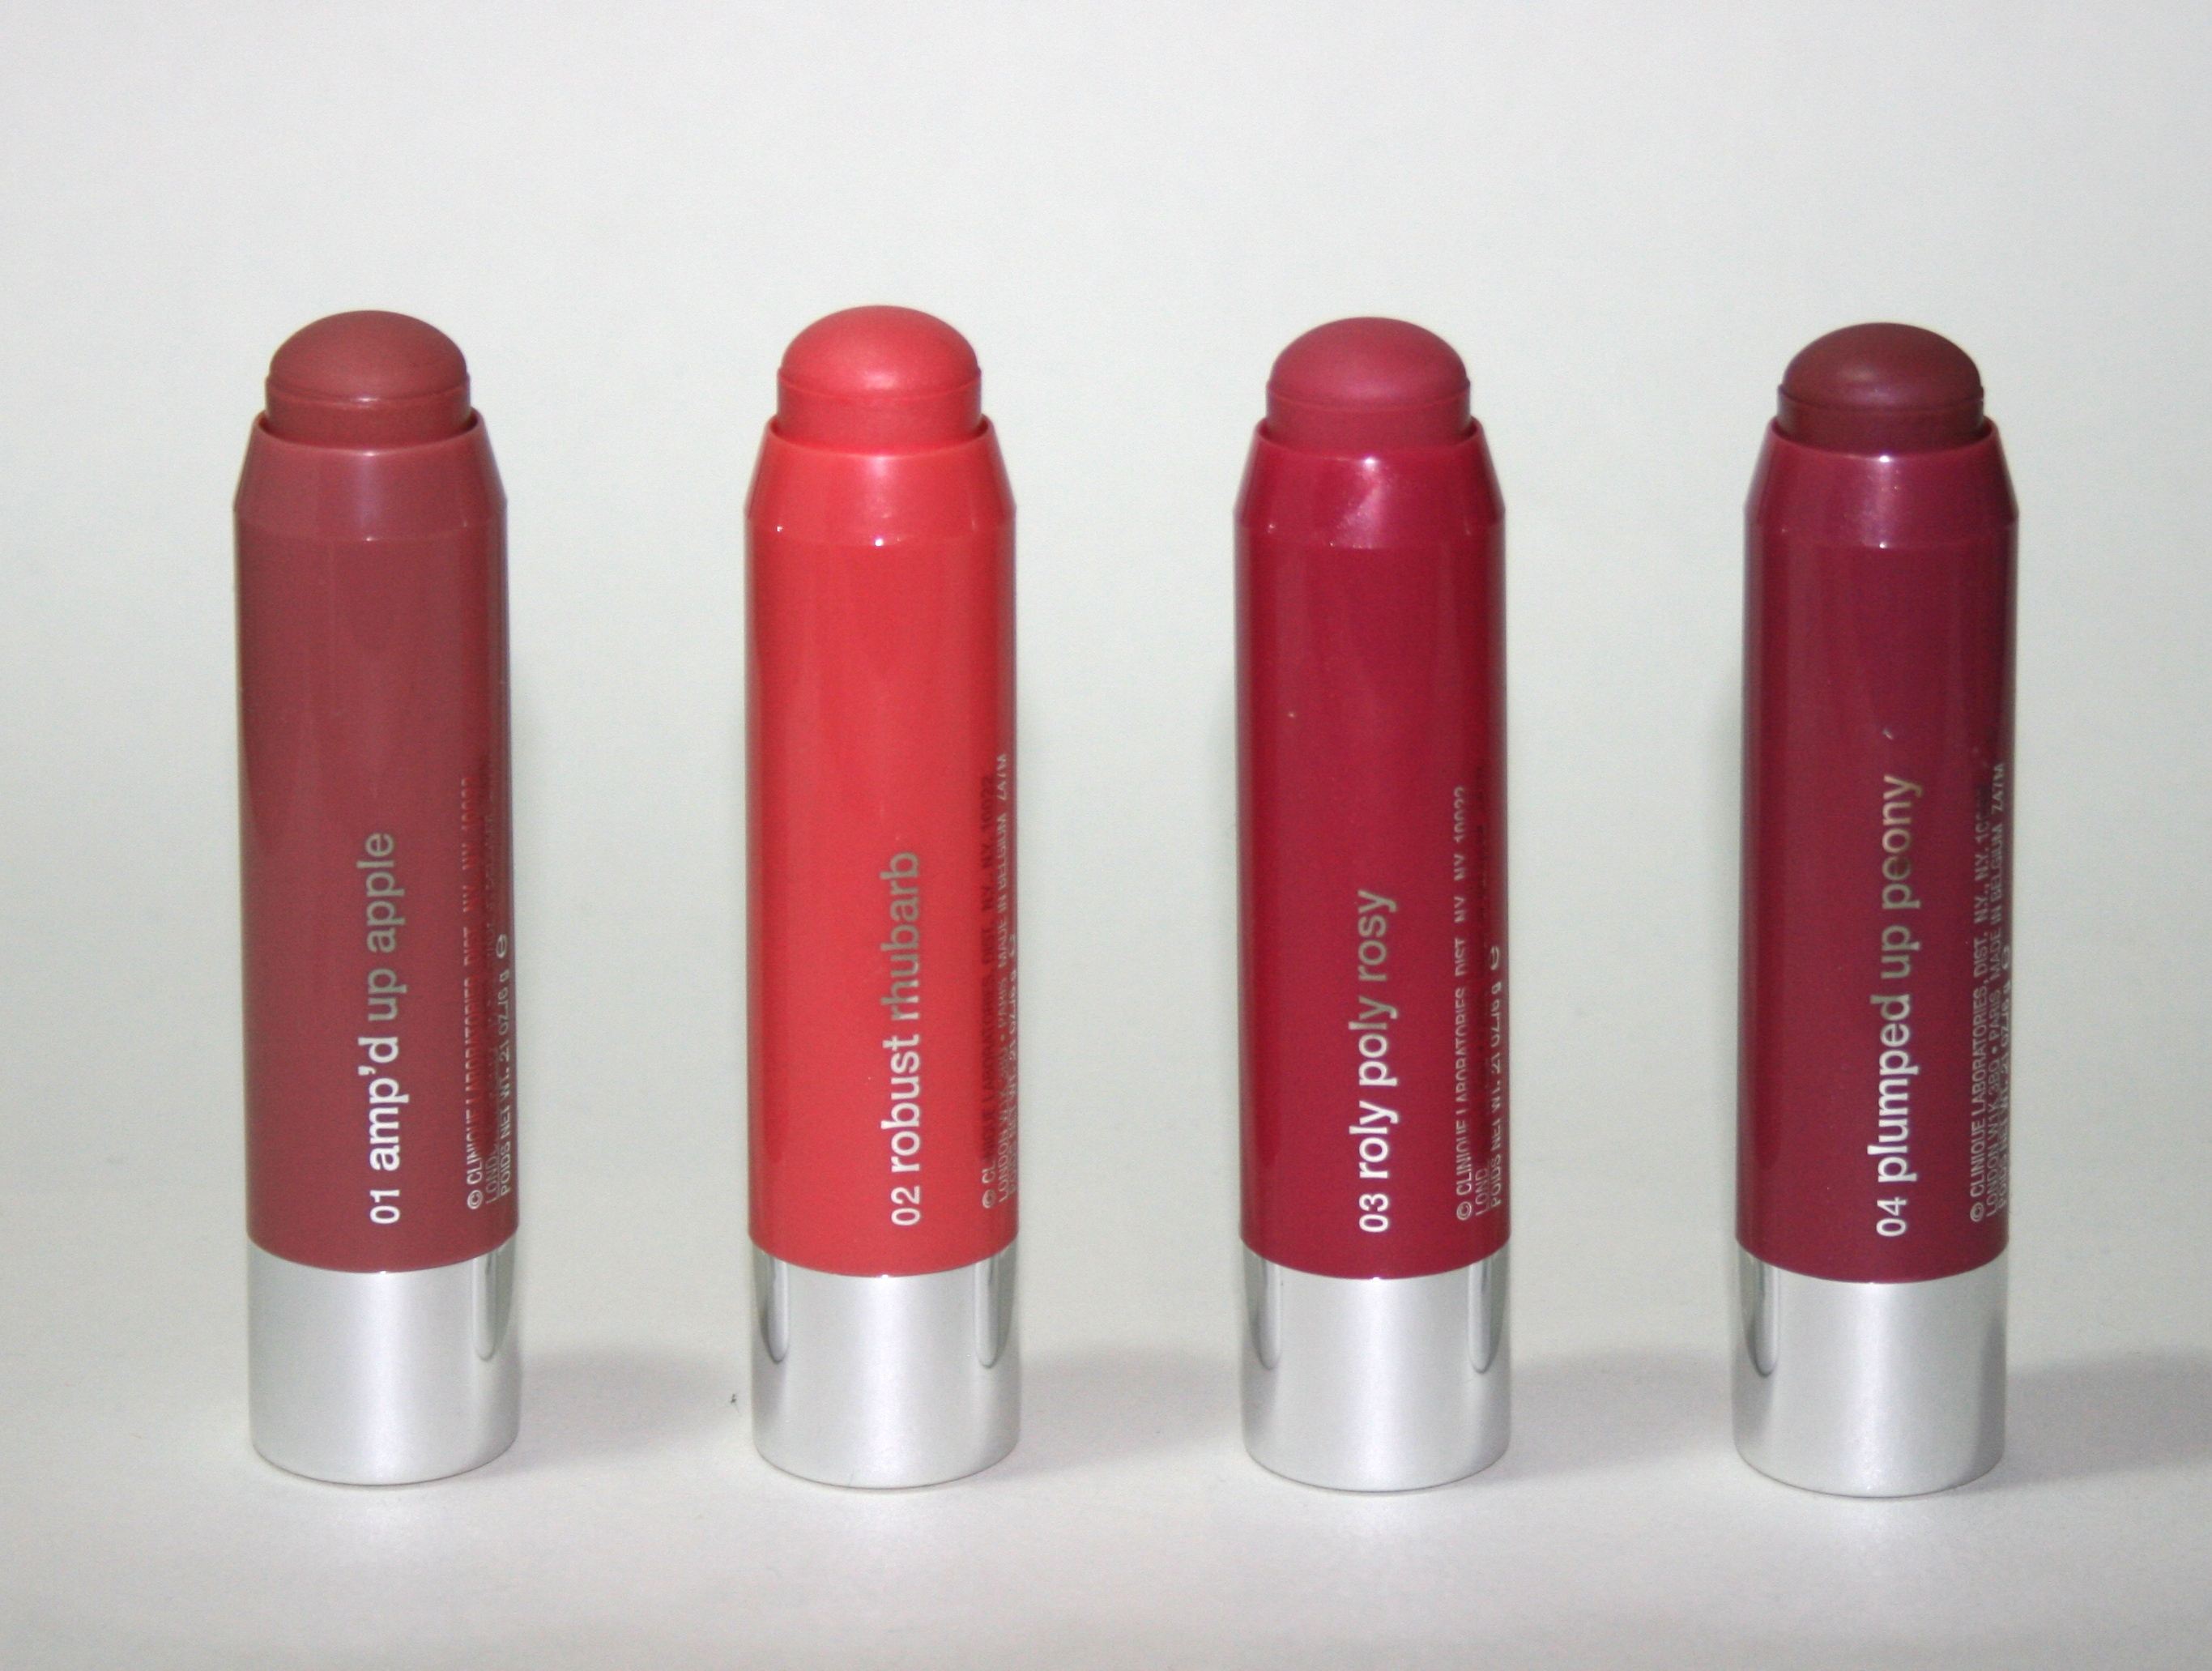 Amazoncom: clinique chubby stick lipstick